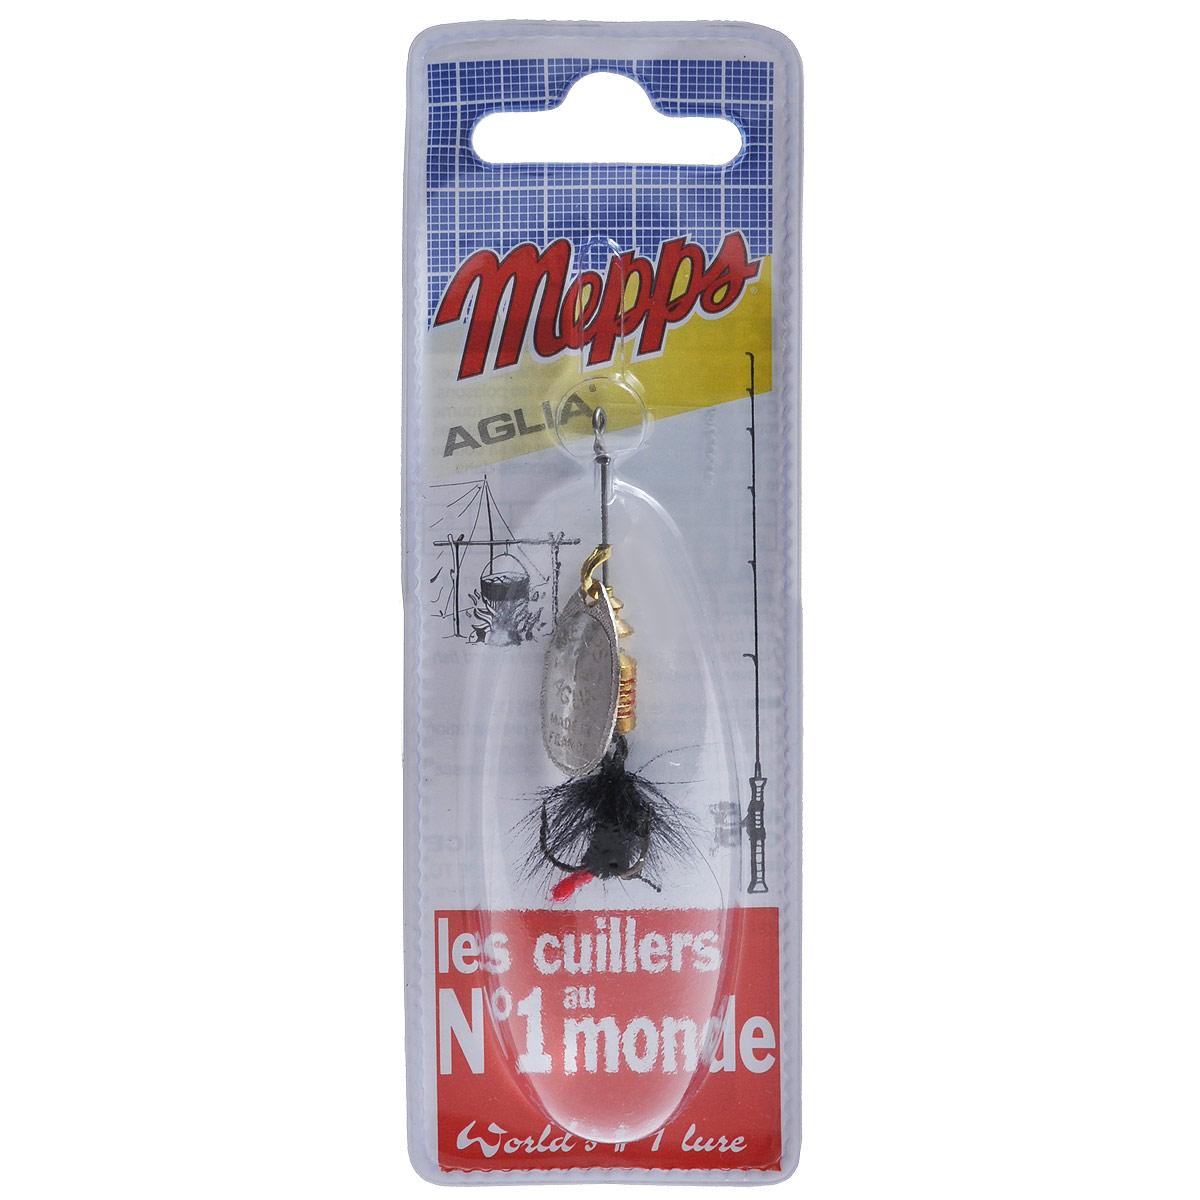 блесна mepps aglia pts rouges or 3 cpar10031 Блесна Mepps Aglia AG Mouch. Noire, вращающаяся, №1